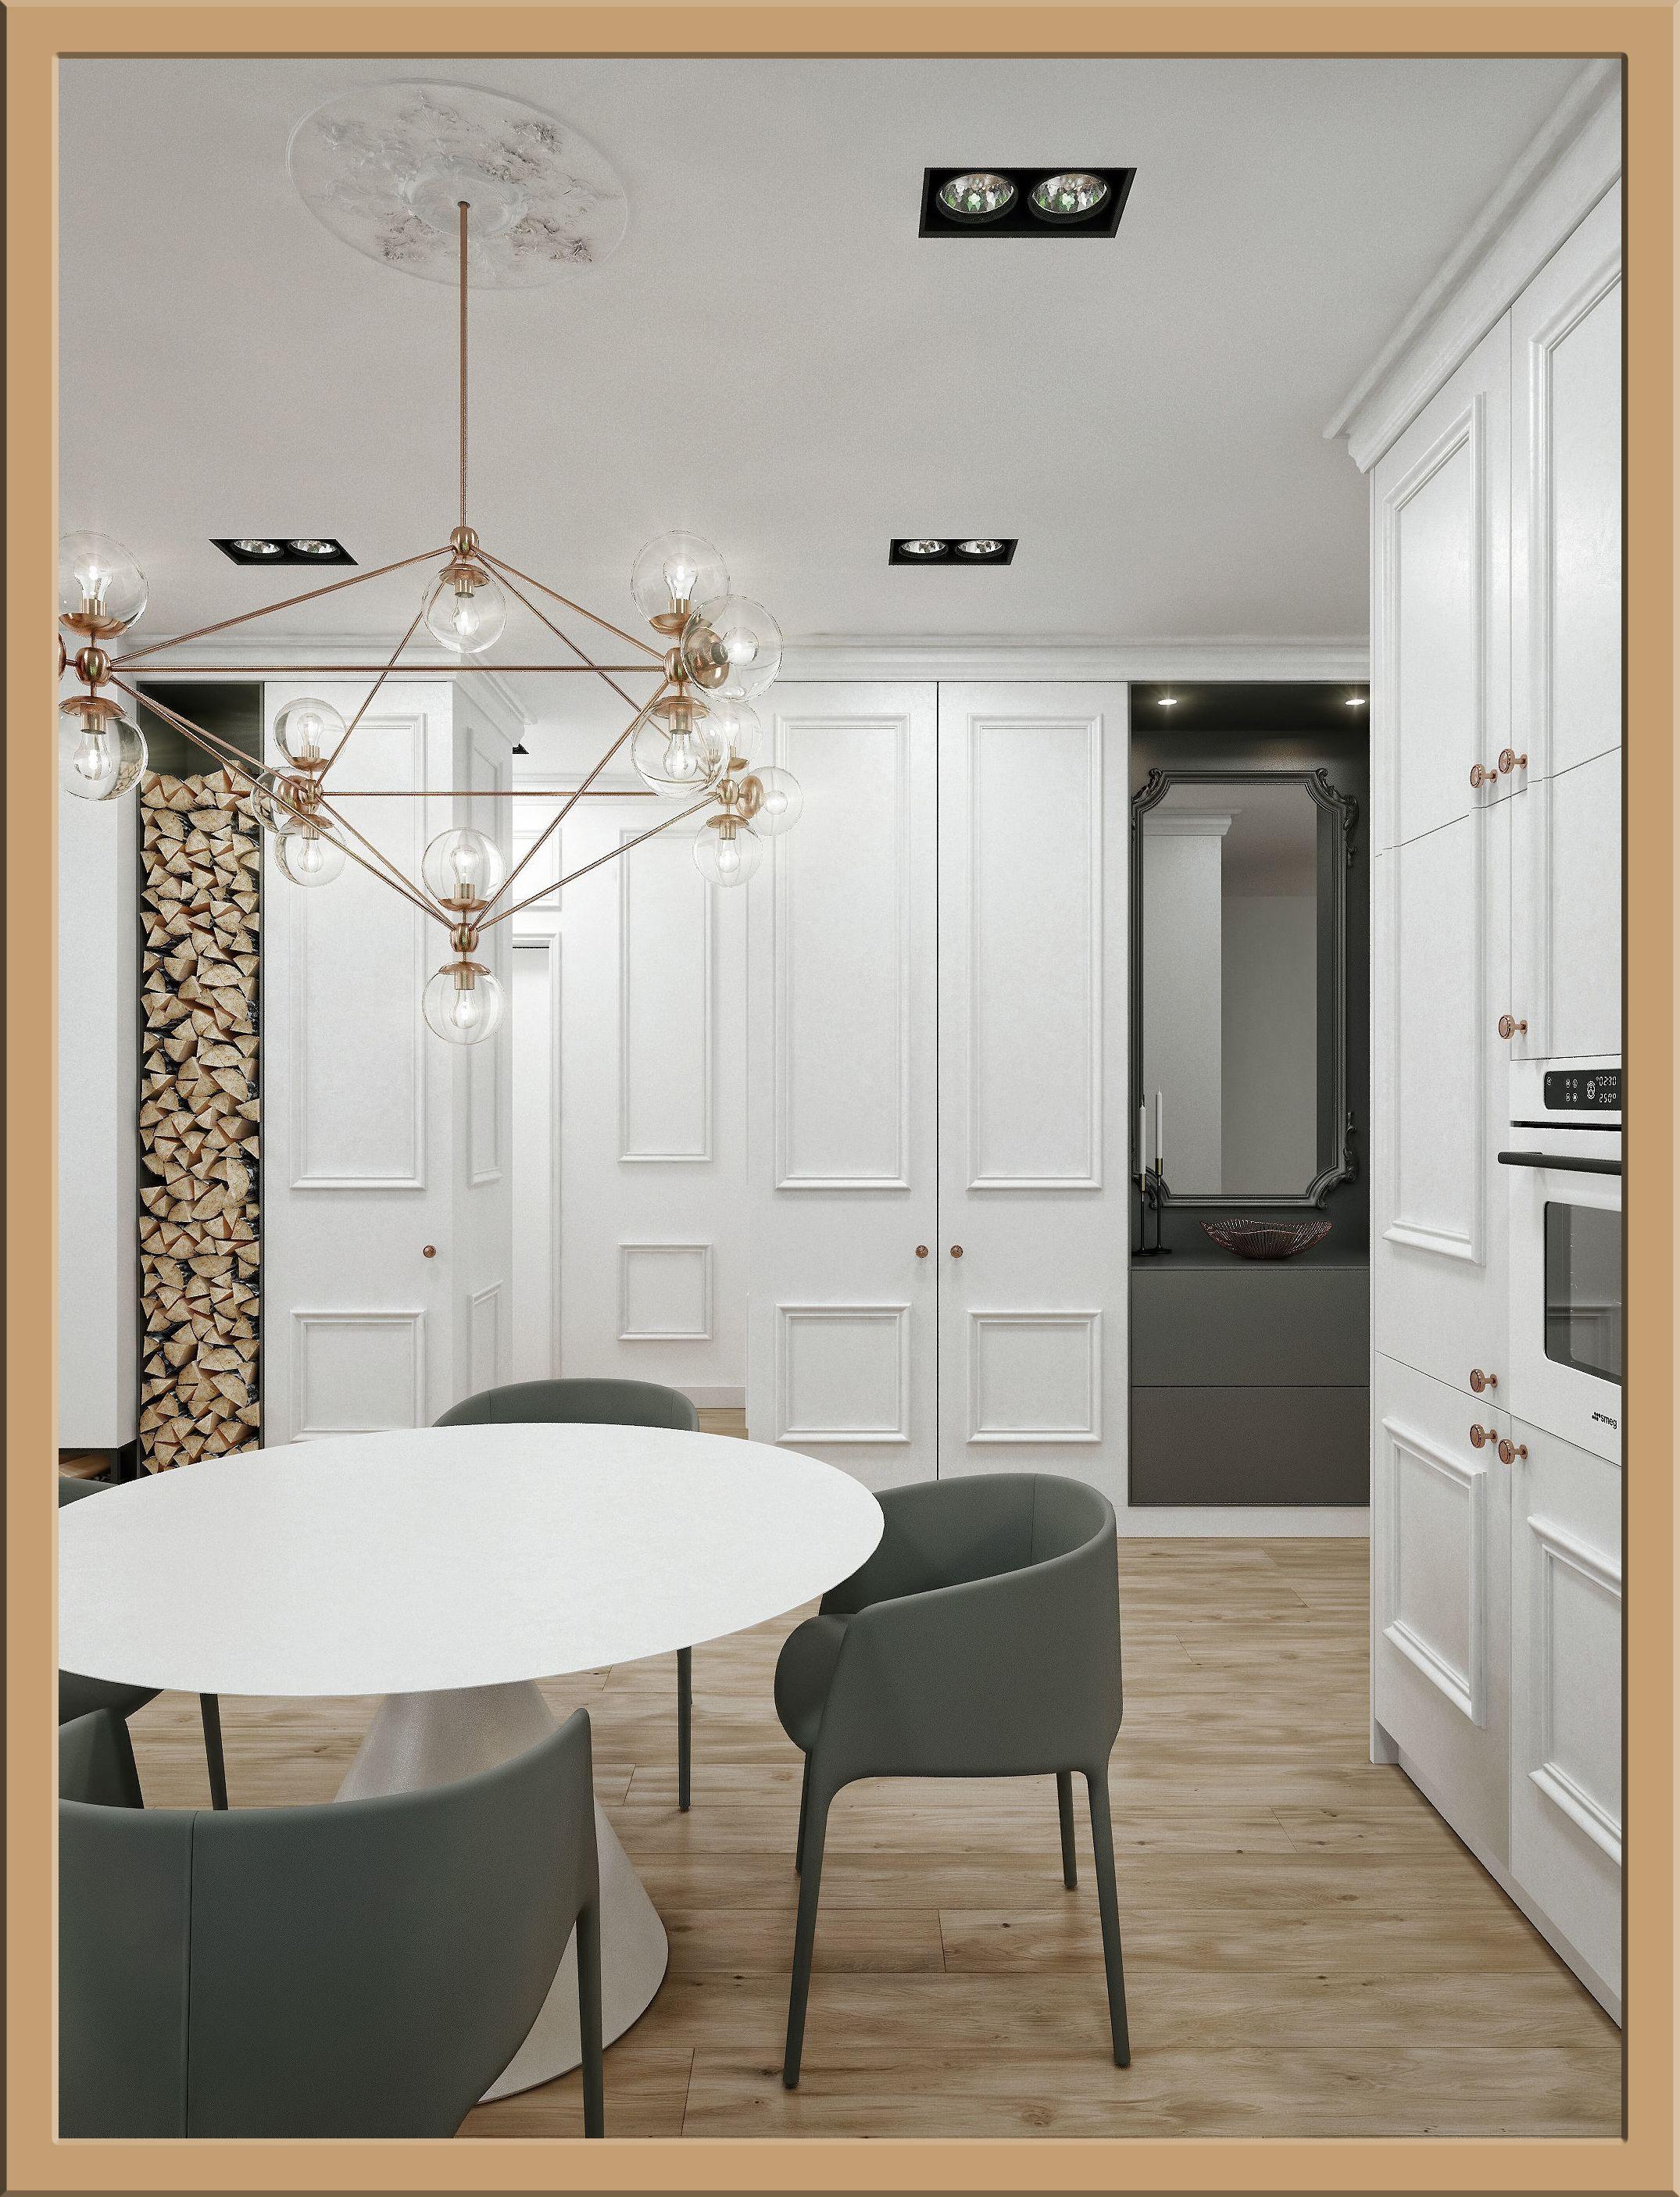 Interior Design Hopes and Dreams